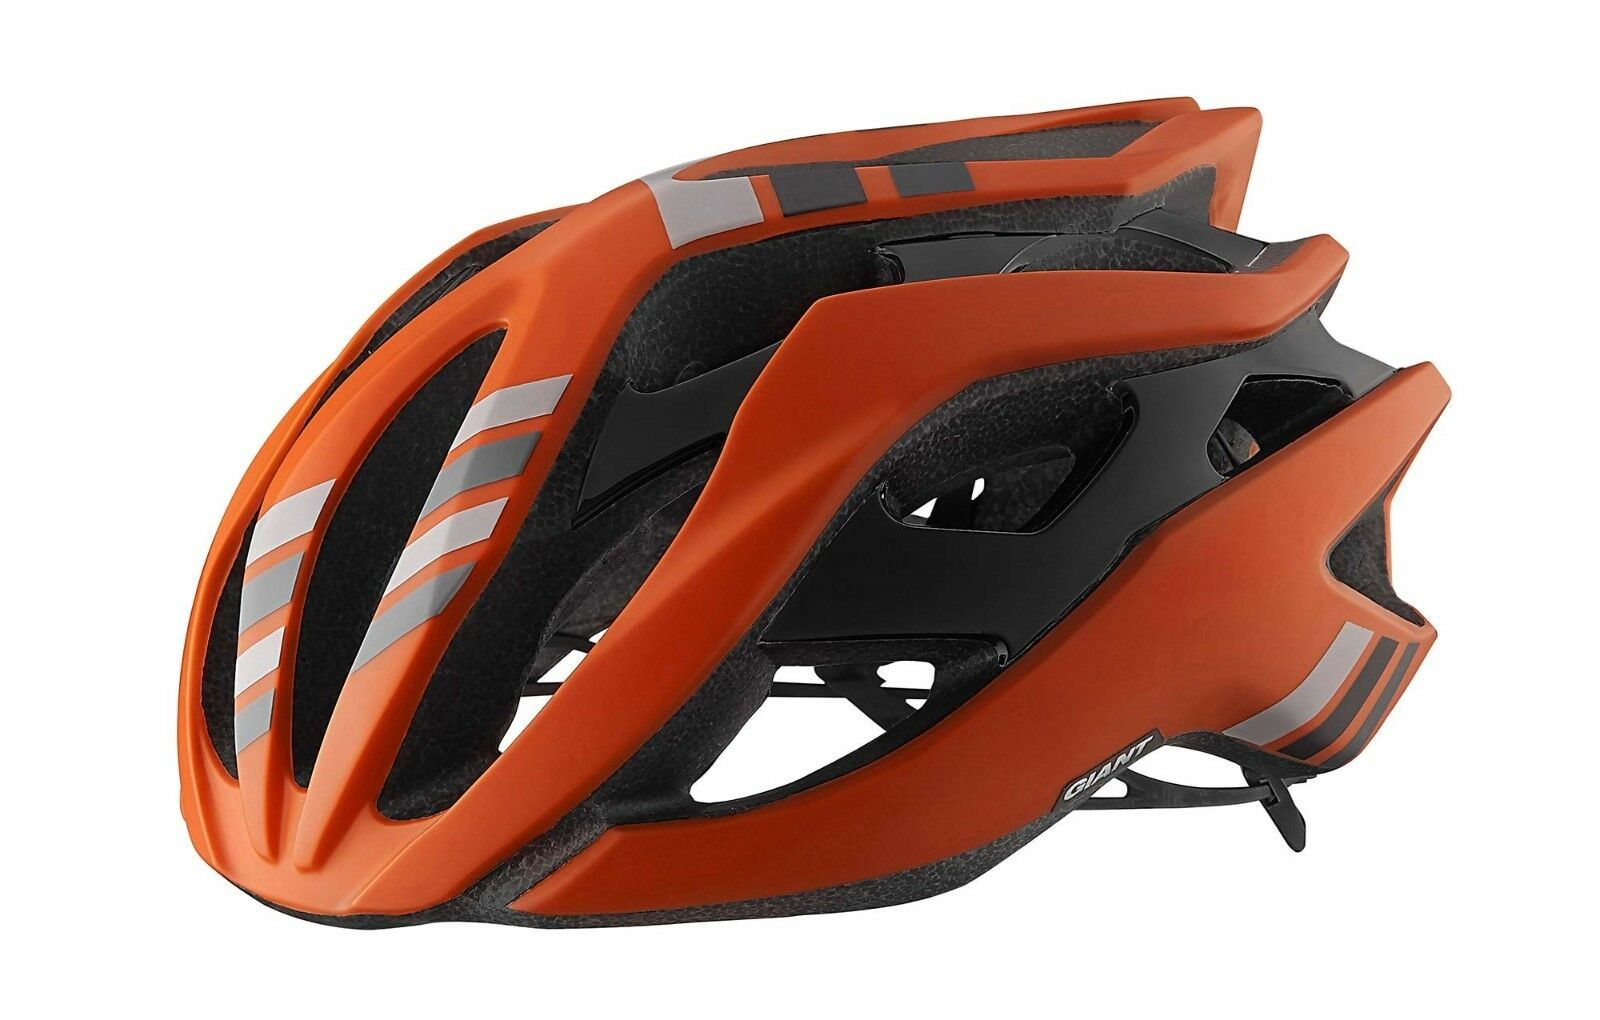 Casco da bici GIANT REV arancia arancione arancio helmet bike road corsa strada